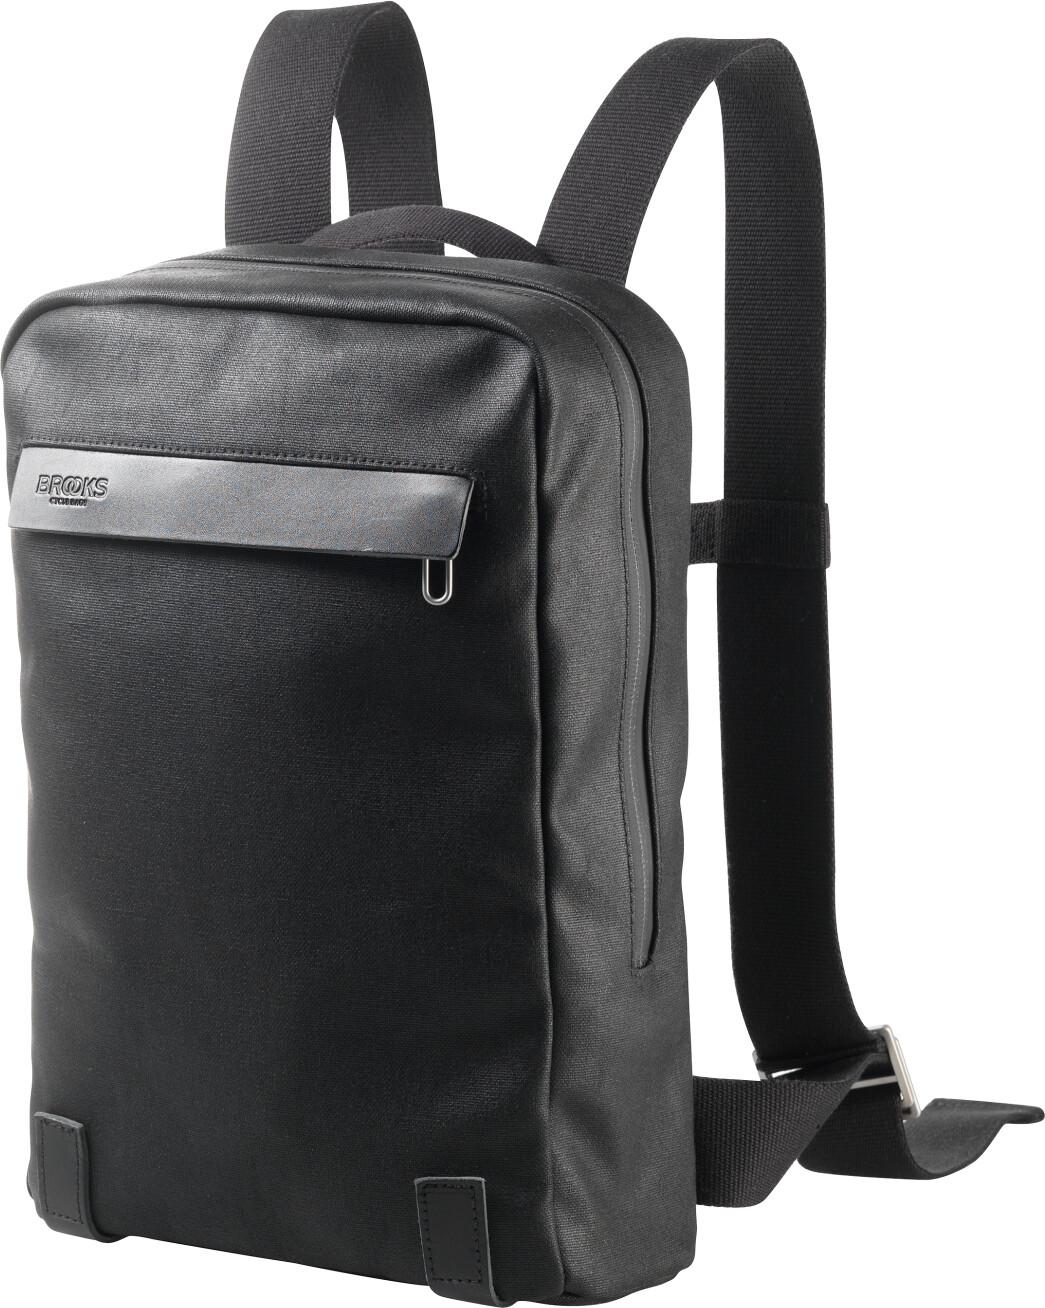 Brooks Pickzip Canvas Rygsæk small, total black (2019) | Travel bags